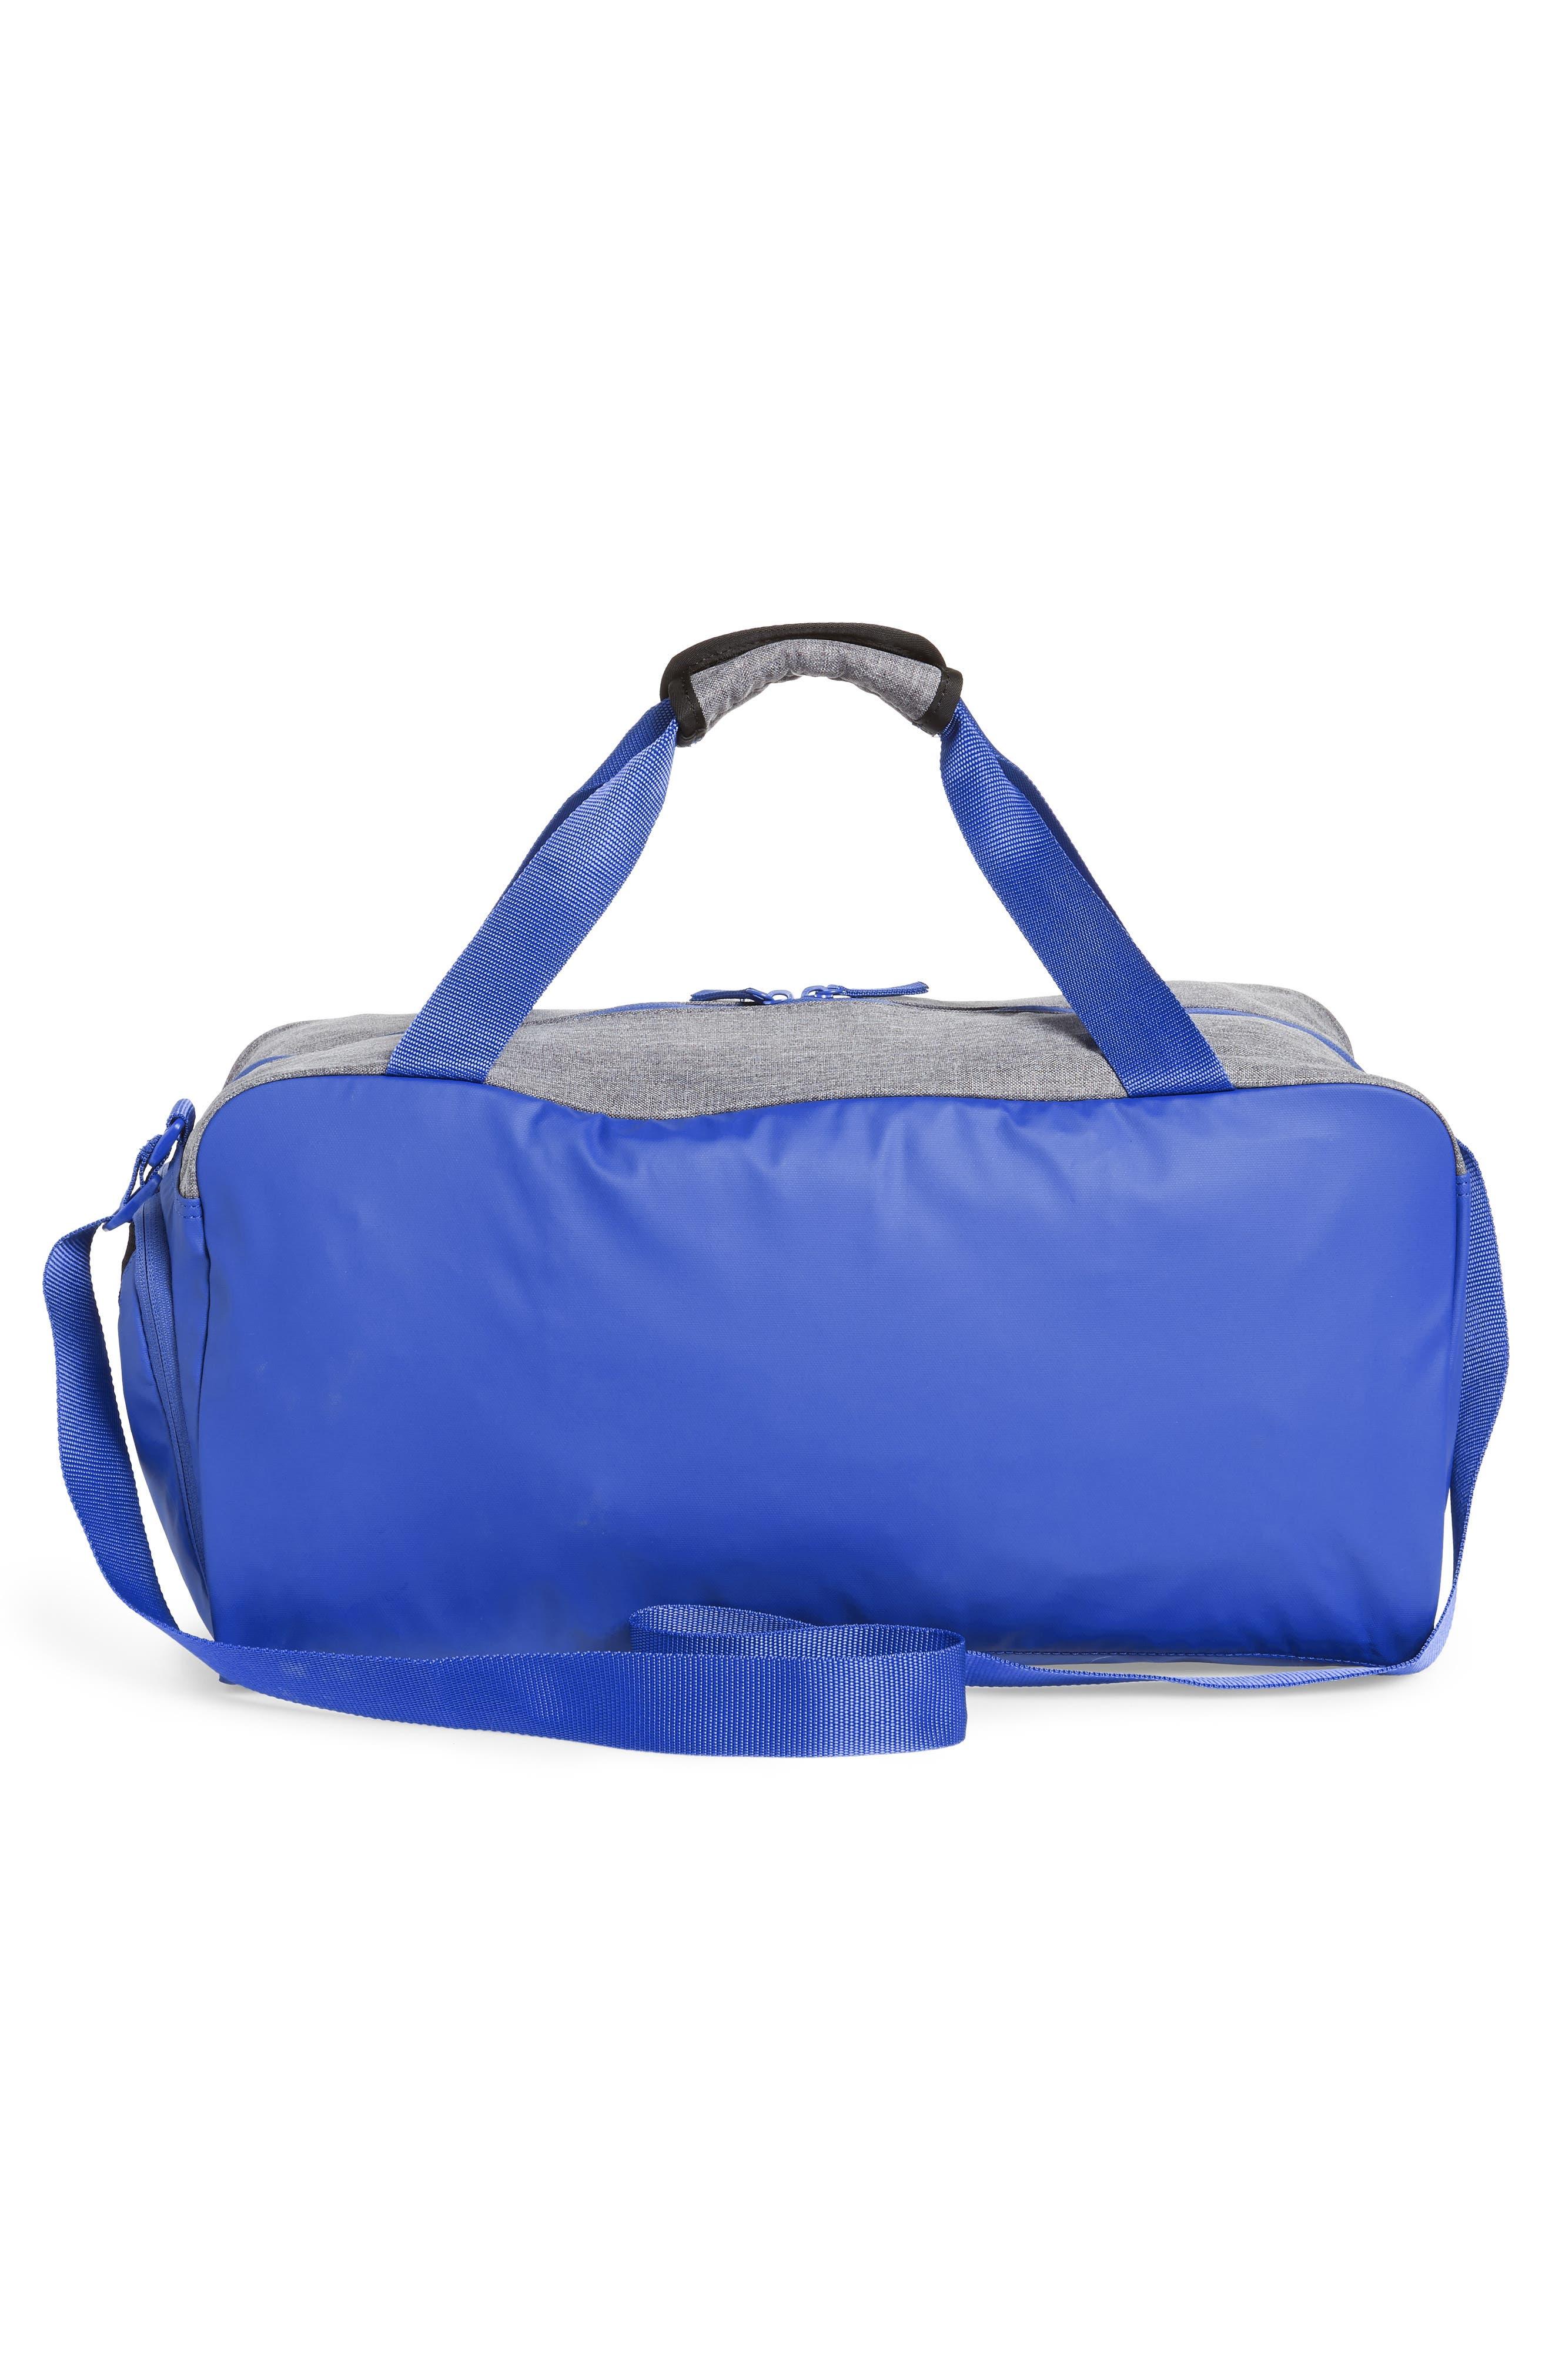 Jordan Pivot Duffle Bag,                             Alternate thumbnail 2, color,                             431